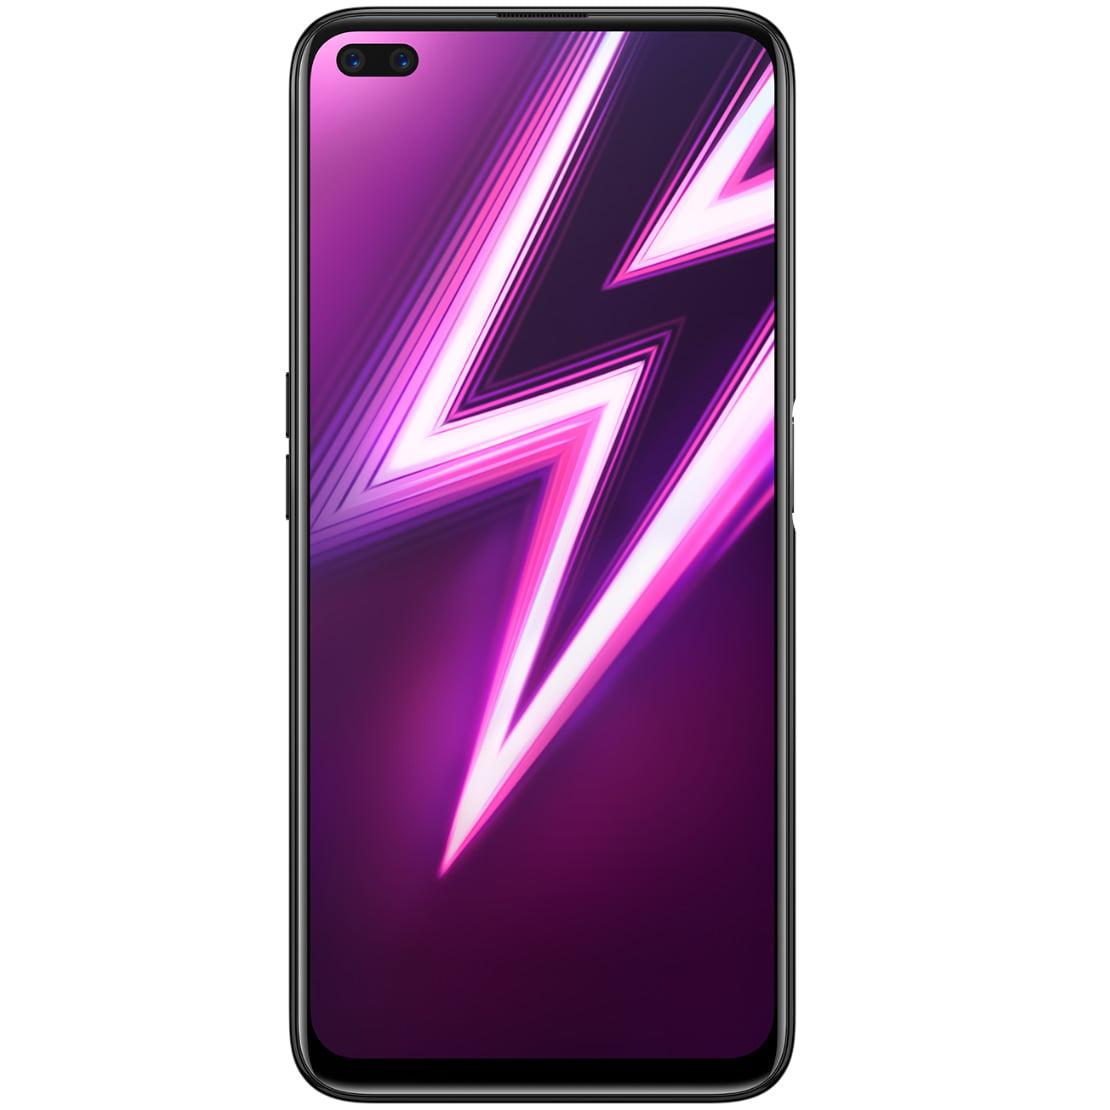 Telefon mobil Realme 6 Pro, Dual SIM, 128GB, 8GB RAM, 4G, Lightning Red